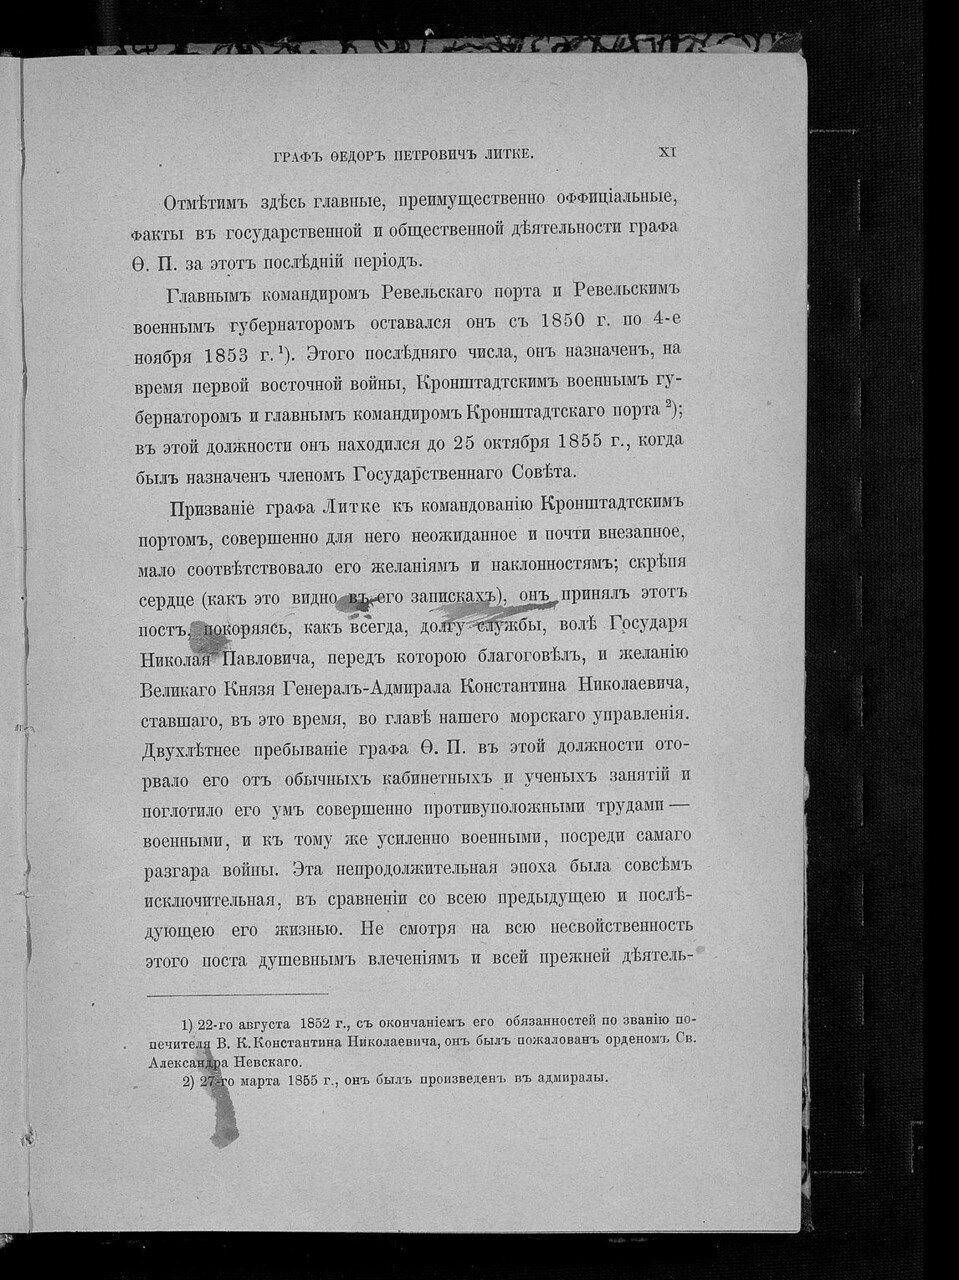 https://img-fotki.yandex.ru/get/27836/199368979.d2/0_21dd5d_a198a4e9_XXXL.jpg